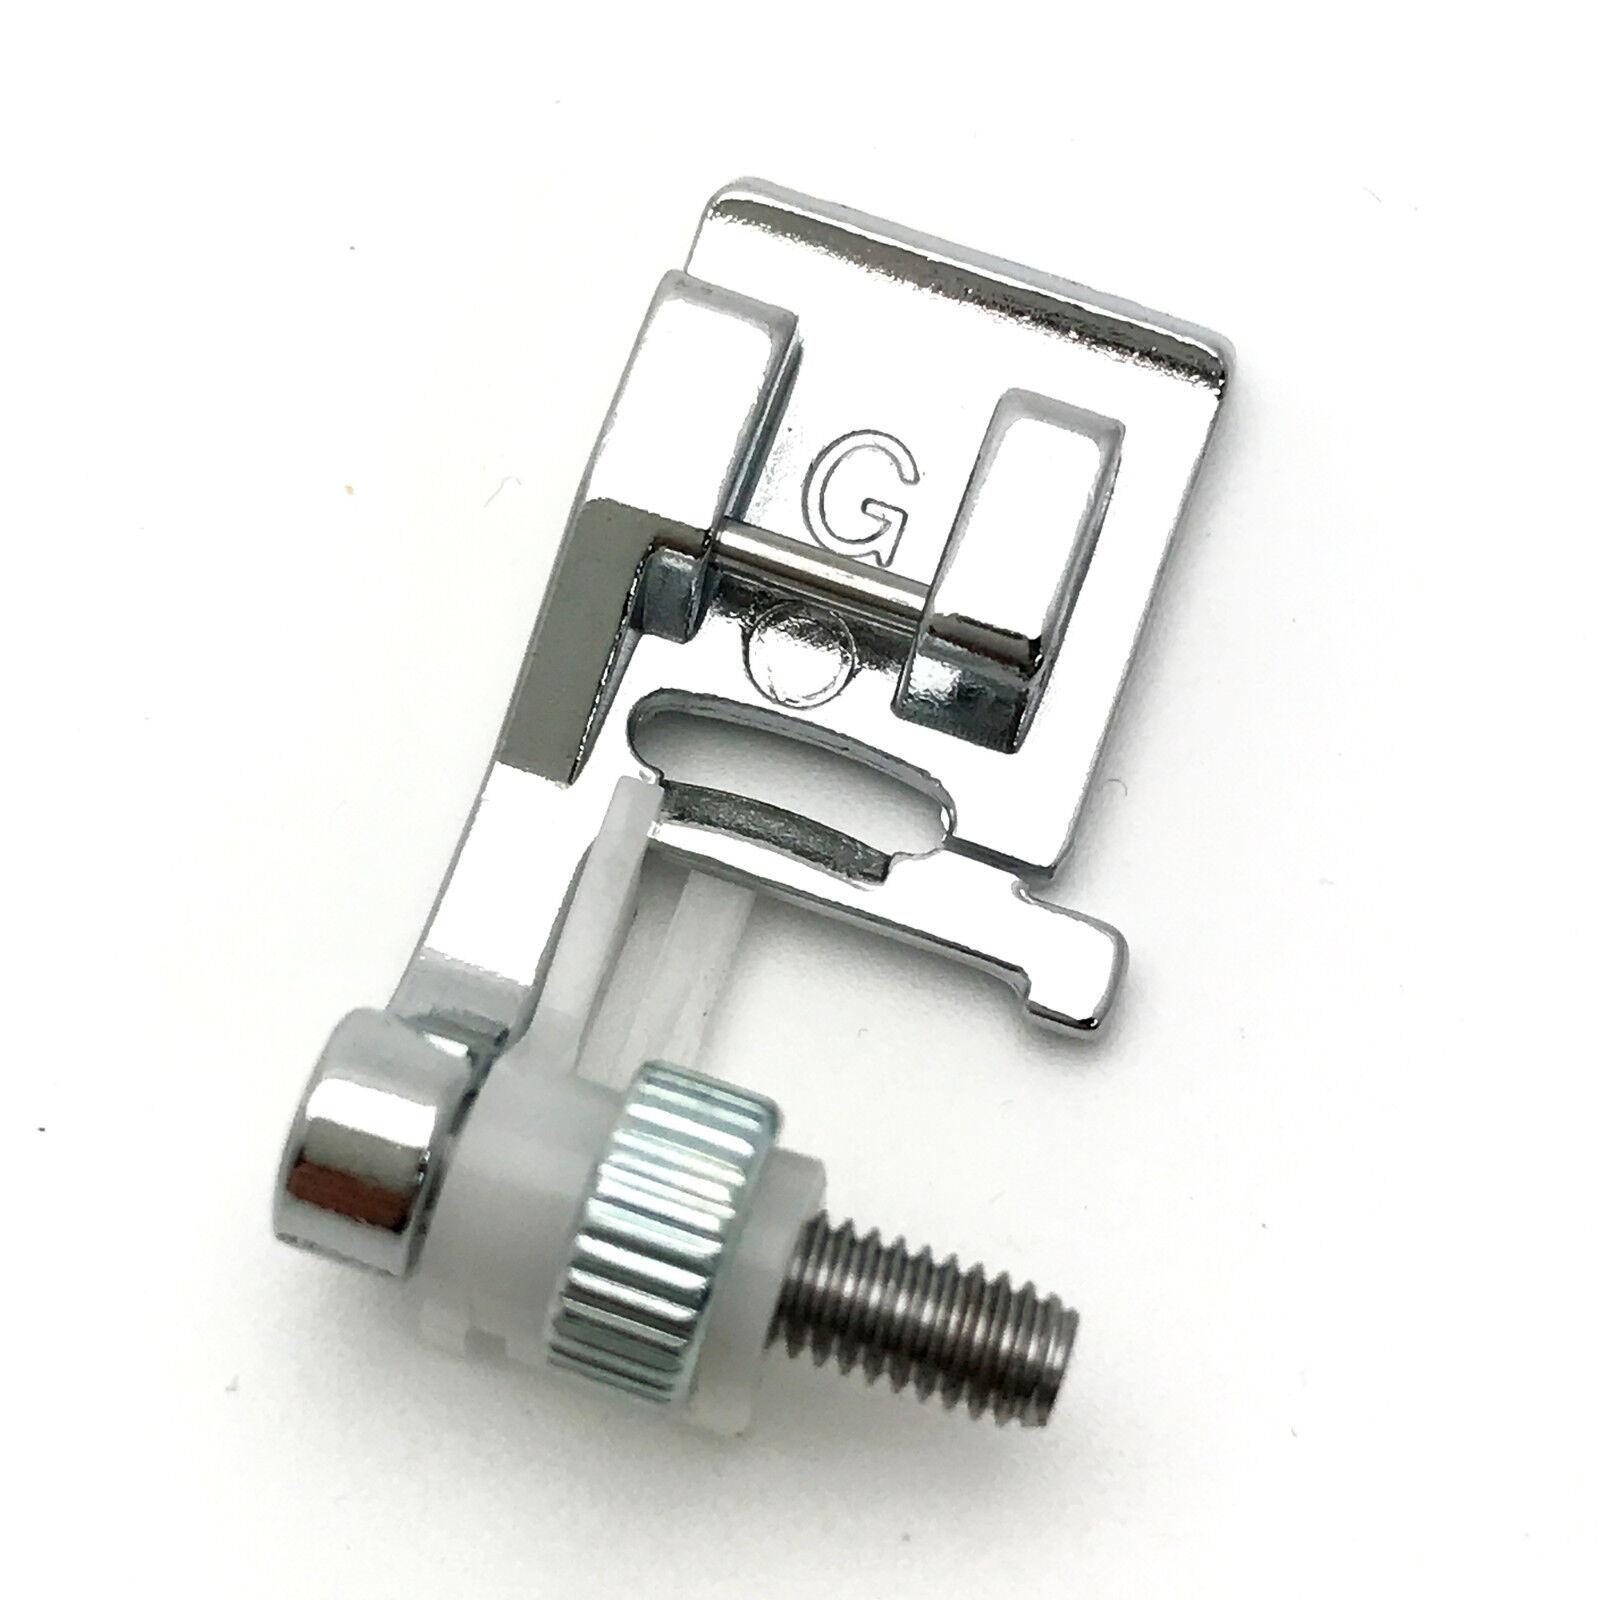 Sewing Machine G Type Adjustable Blind Hem Presser Foot # 820817015